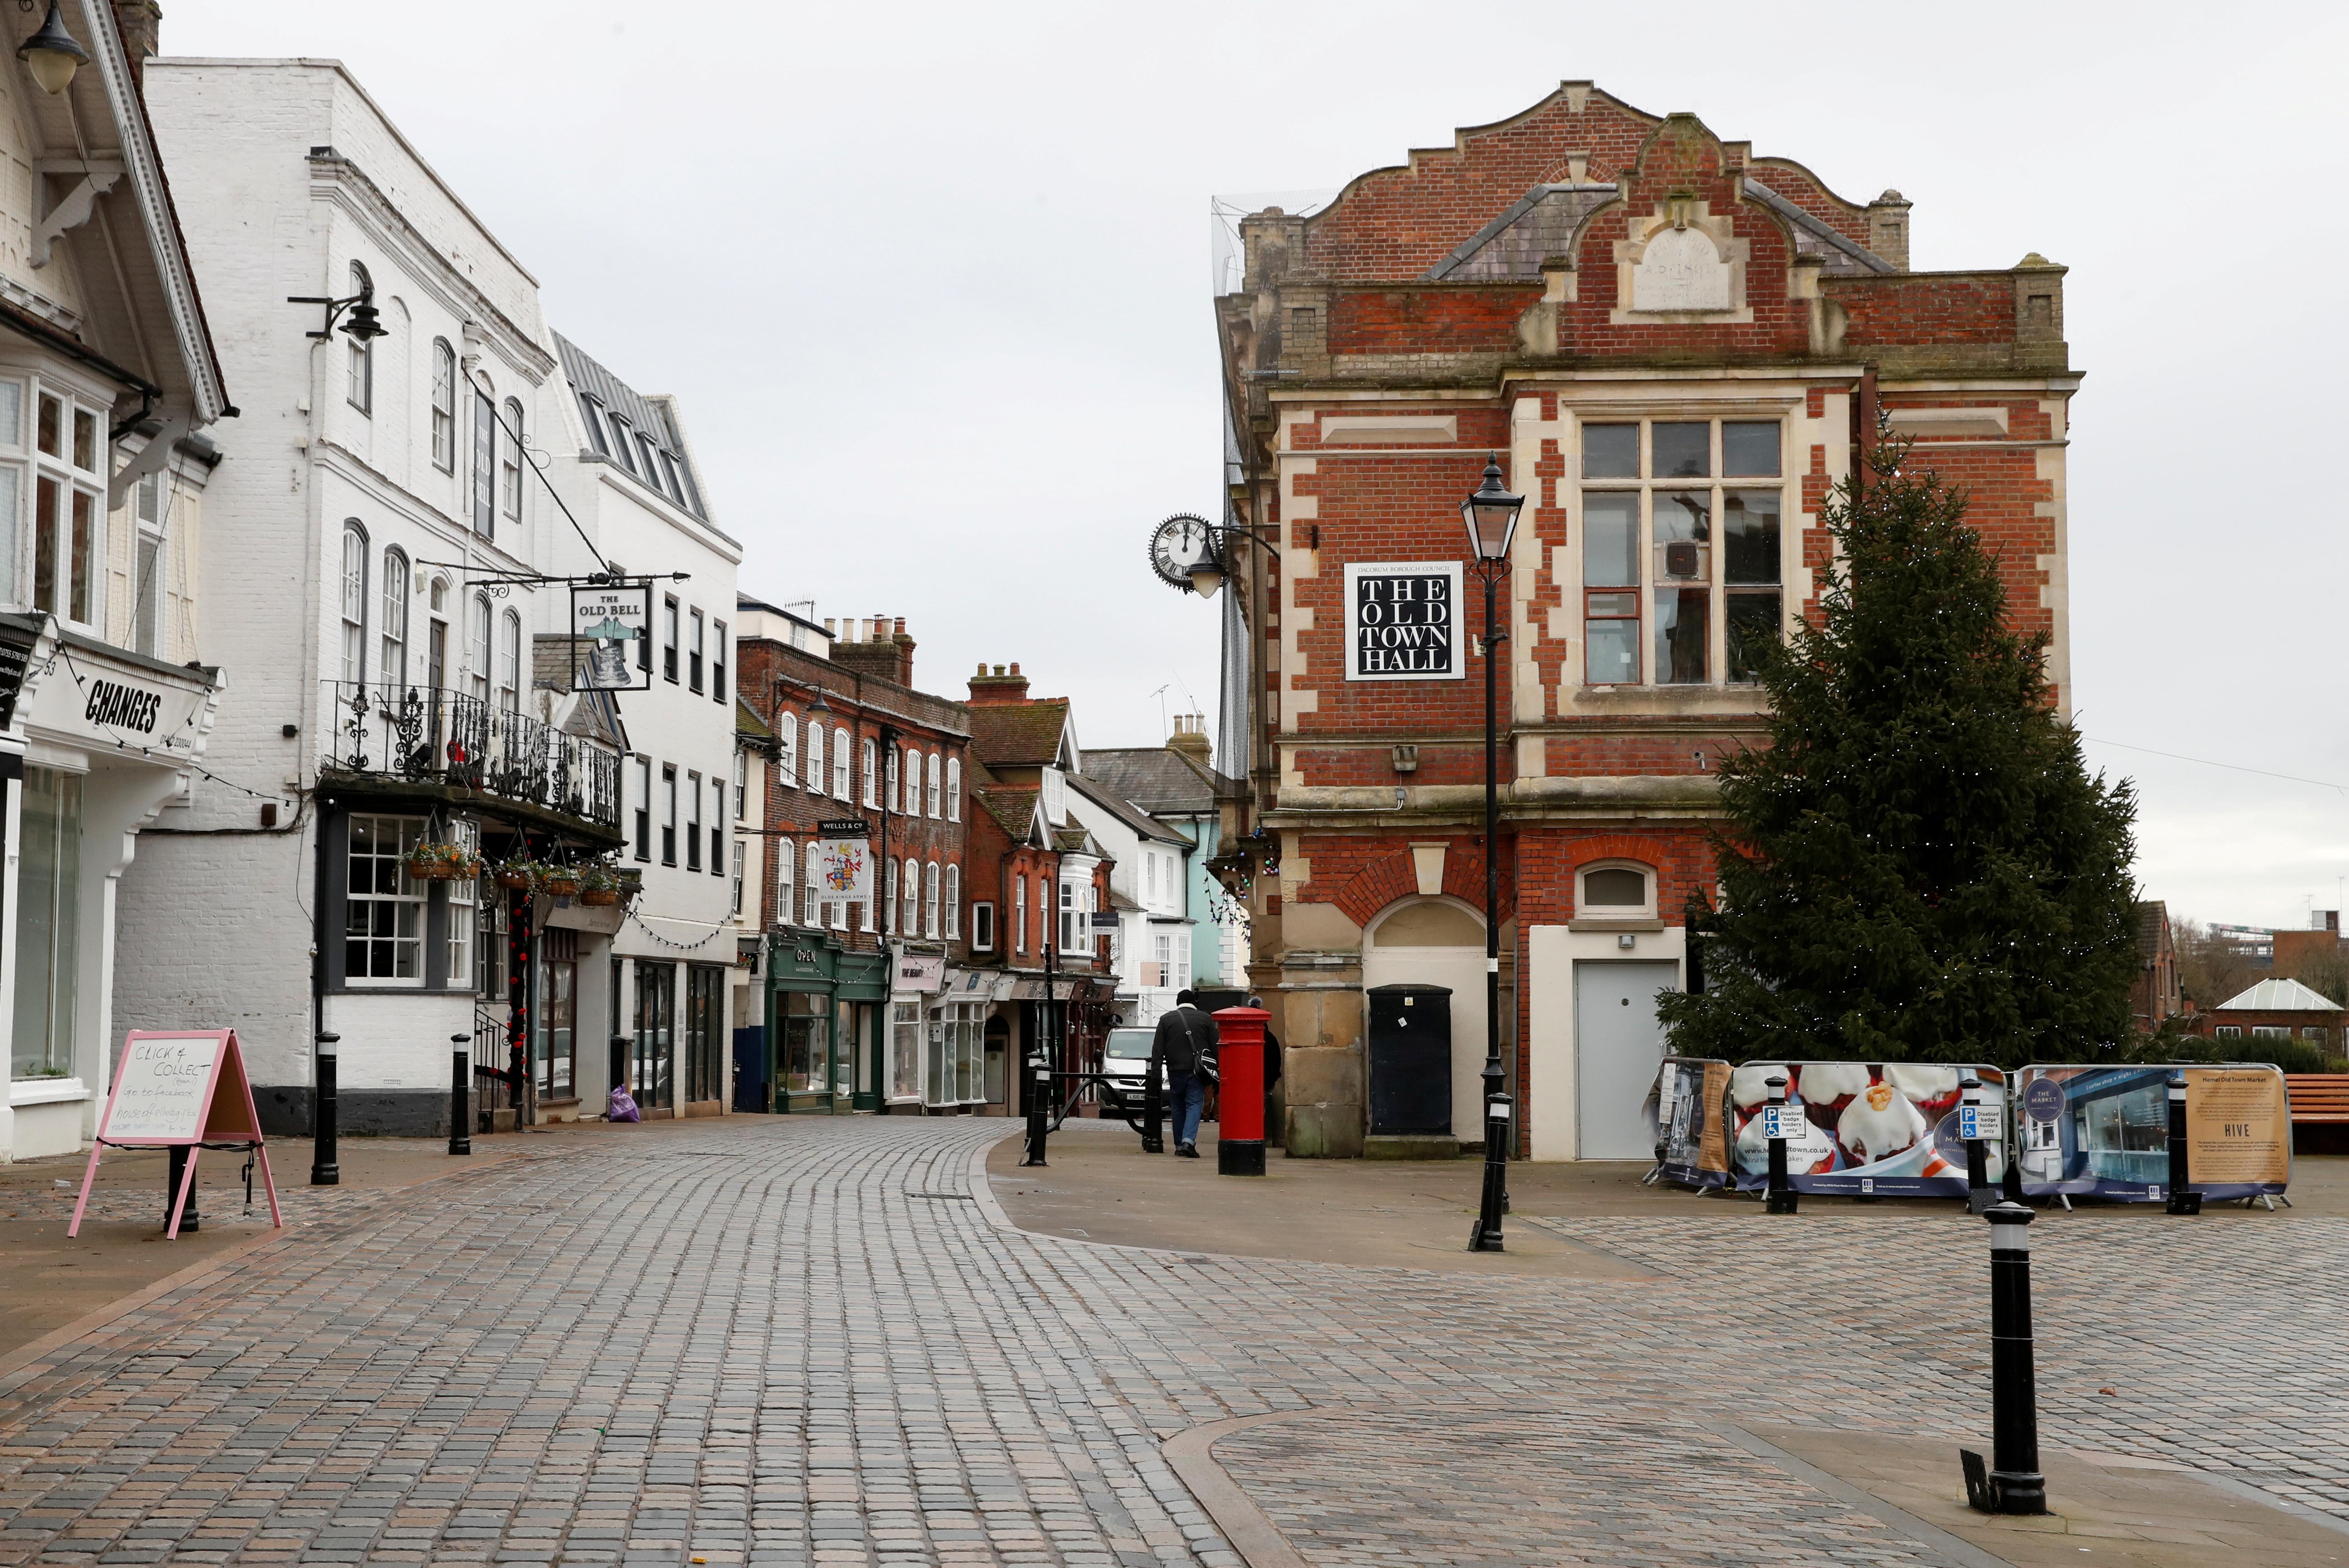 A view of a deserted street in Hemel Hempstead, Britain, January 5, 2021. REUTERS/Matthew Childs